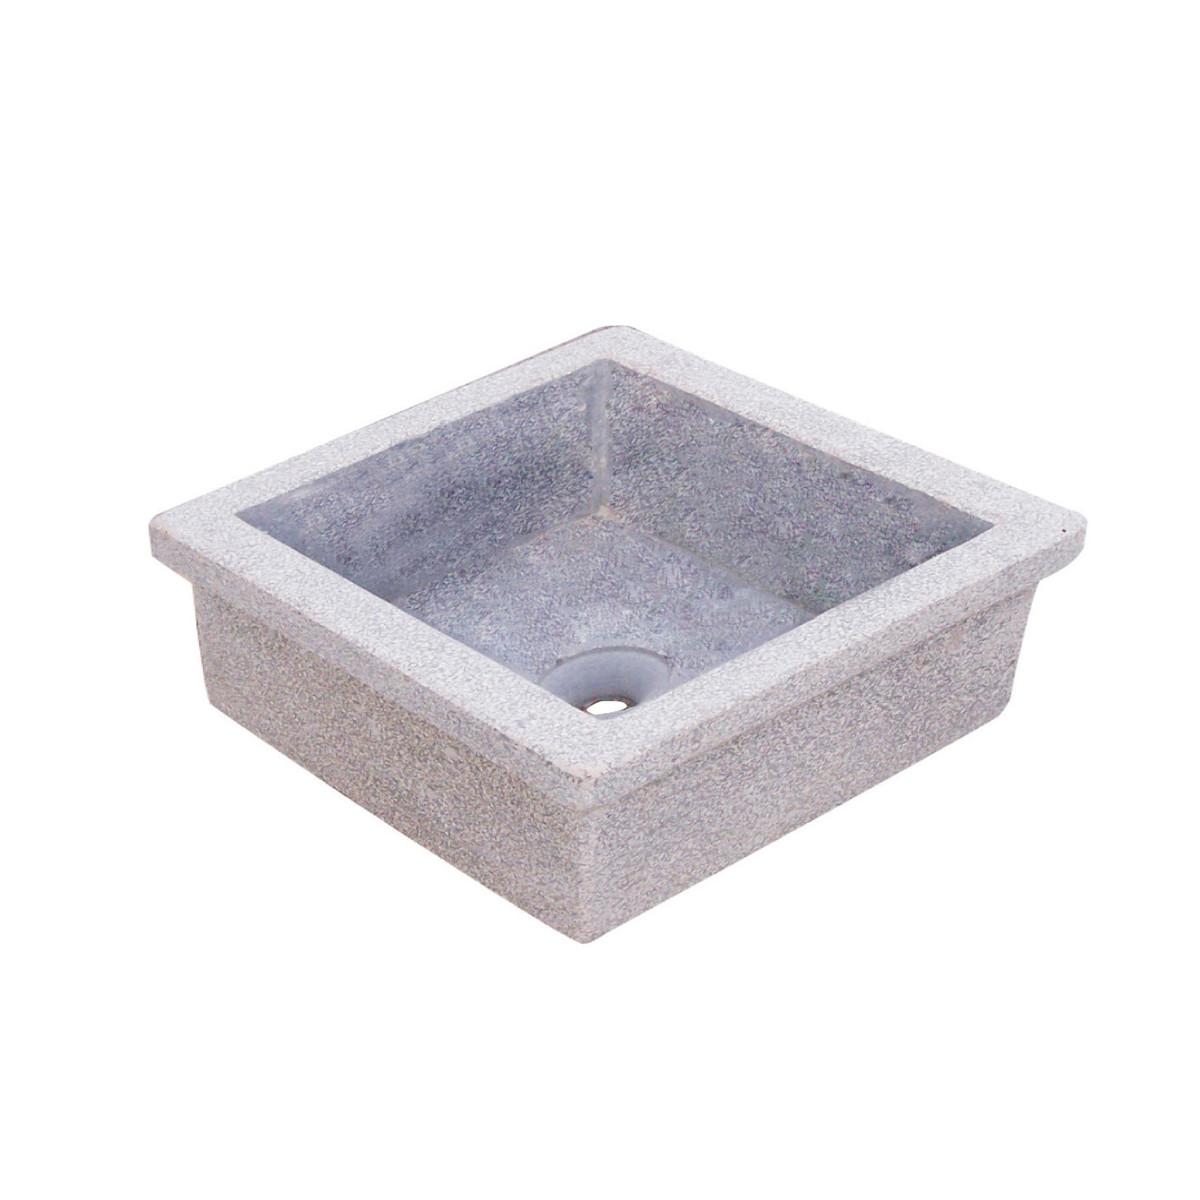 Lavandino cucina cemento : lavabo cucina cemento. lavandino cucina ...